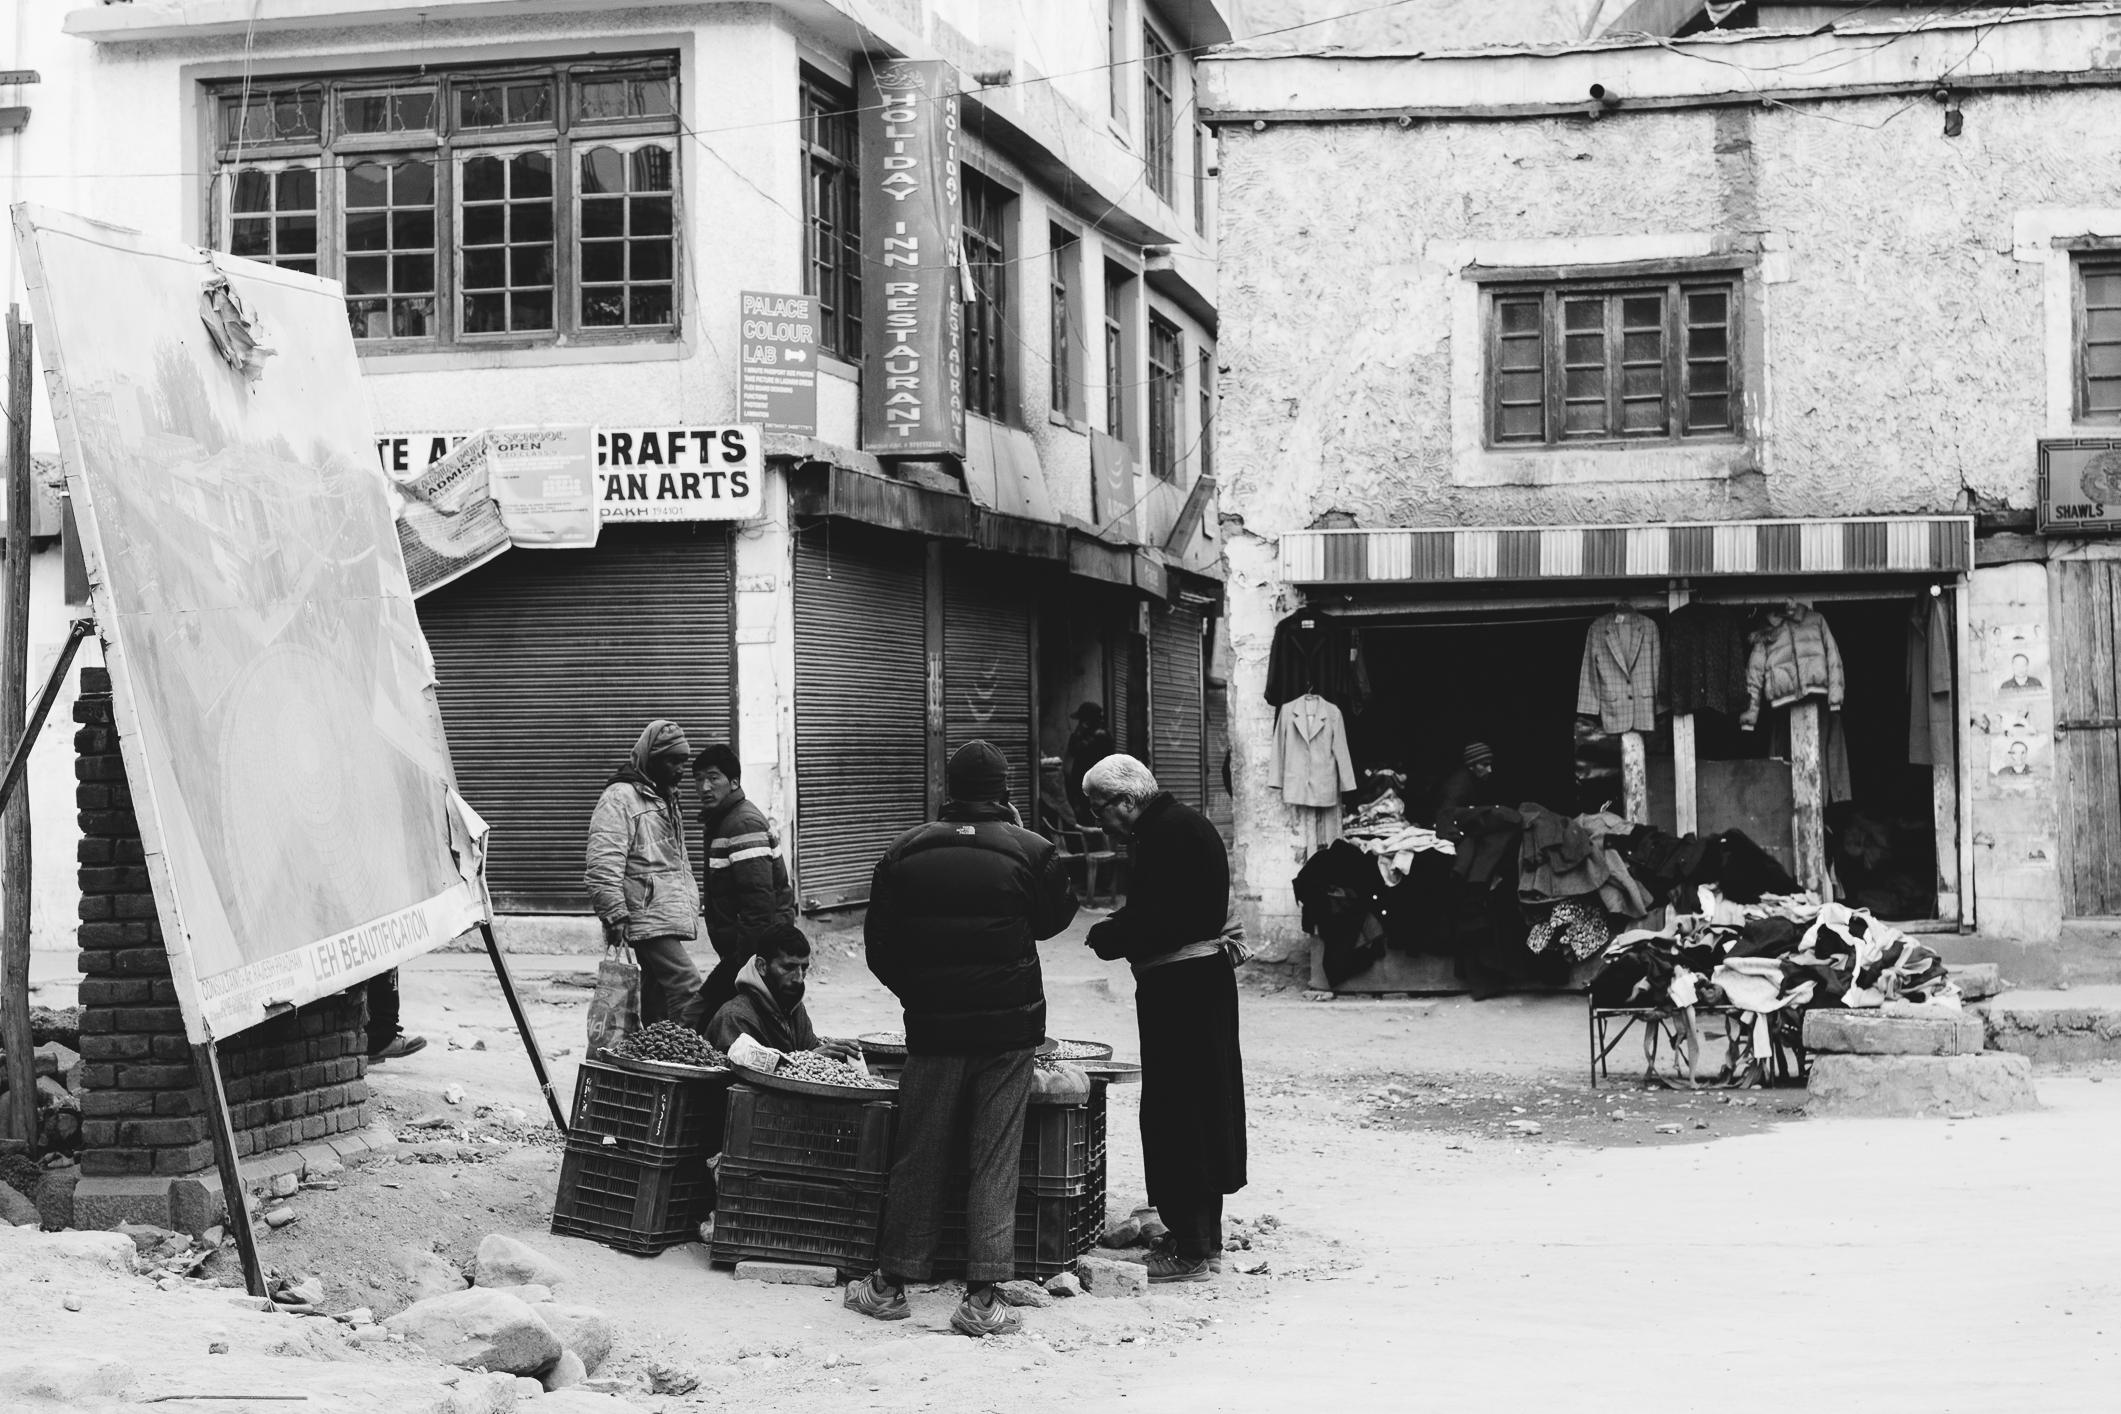 Ladakh_15_Irie_Langlois58.jpg